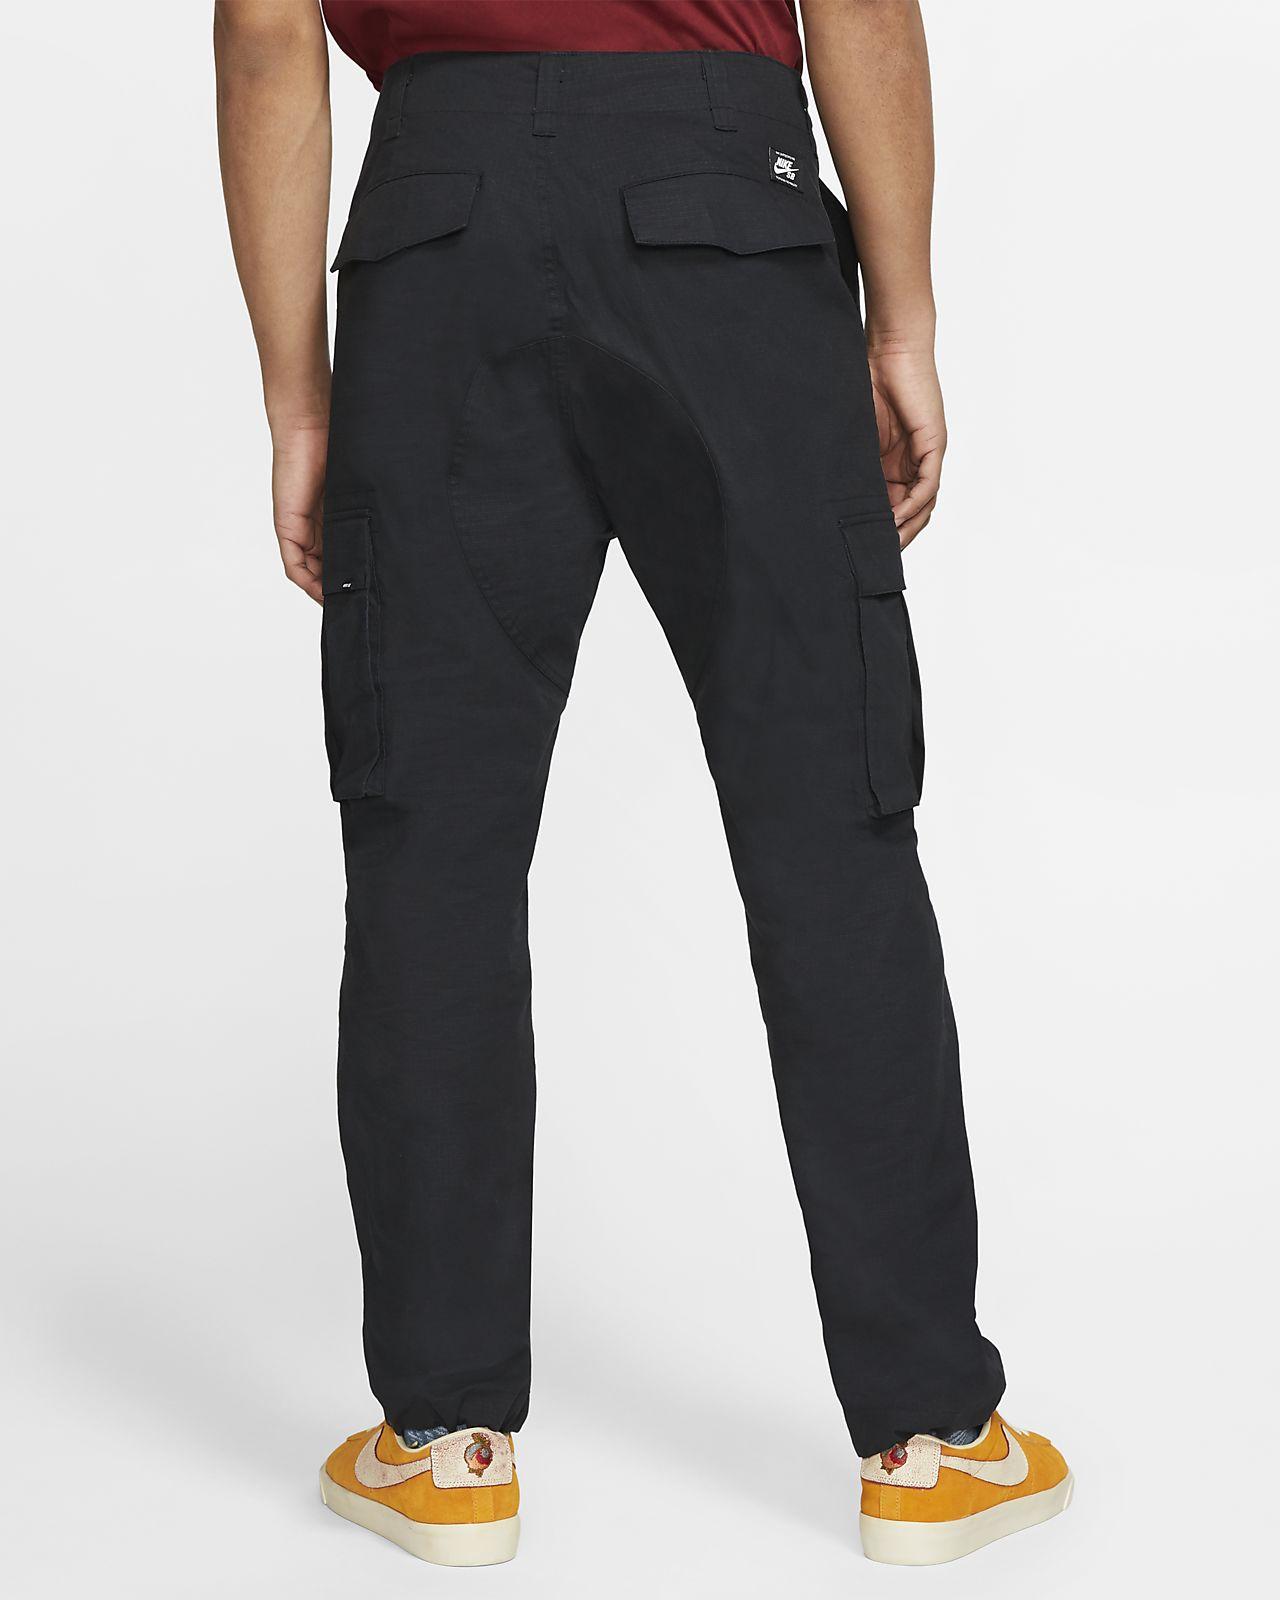 nike pantaloni cargo donna